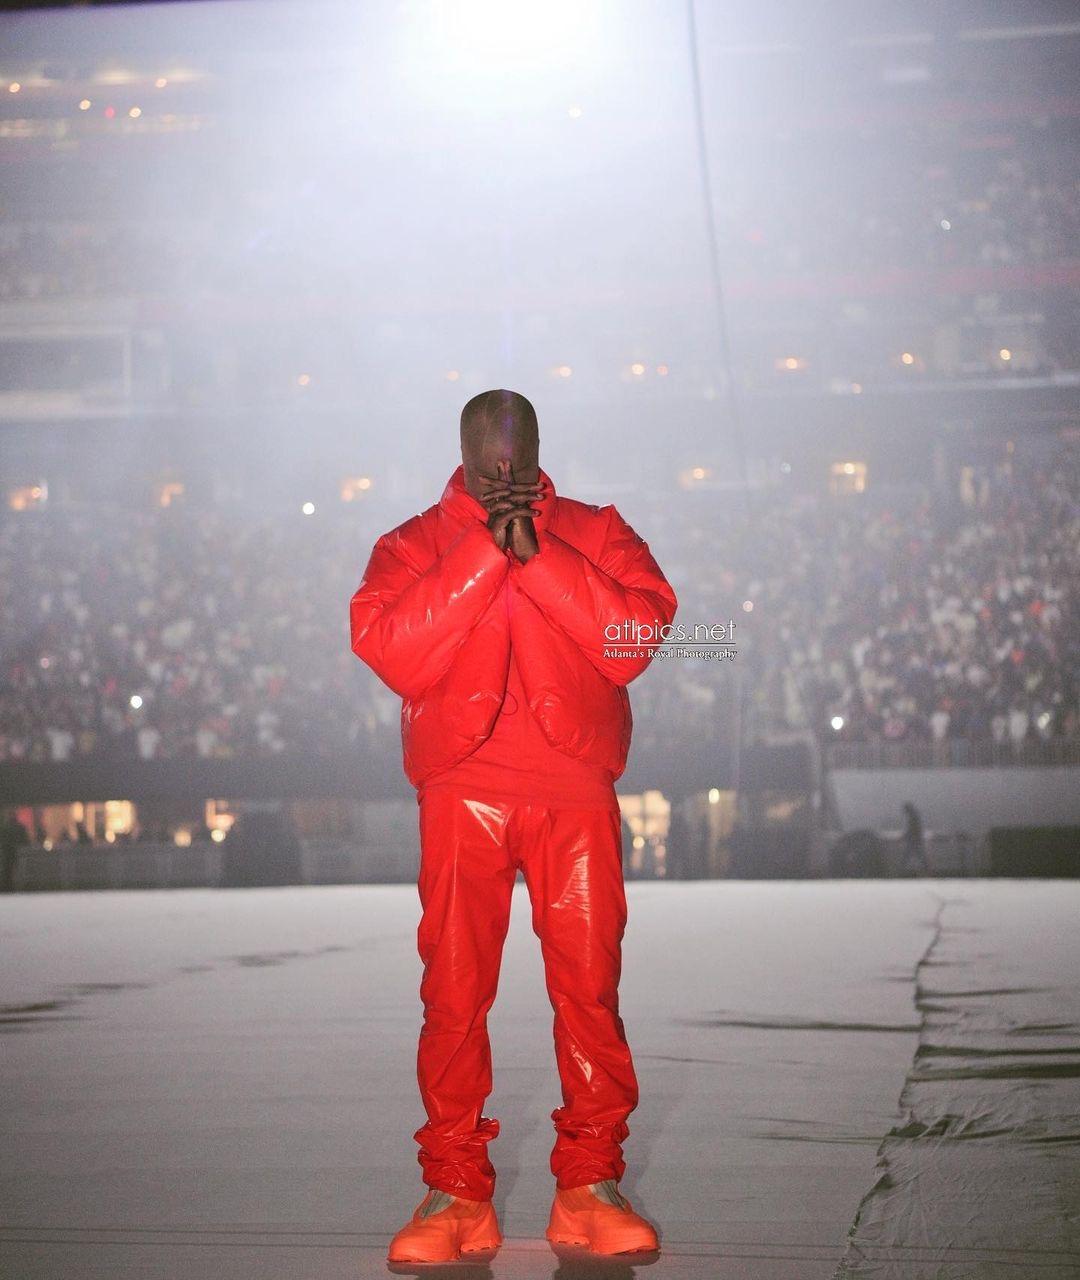 Kanye West Debuts Donda Album in Atlanta in All Red Yeezy x Gap Look + Kim and Khloe Kardashian Attend in Rick Owens